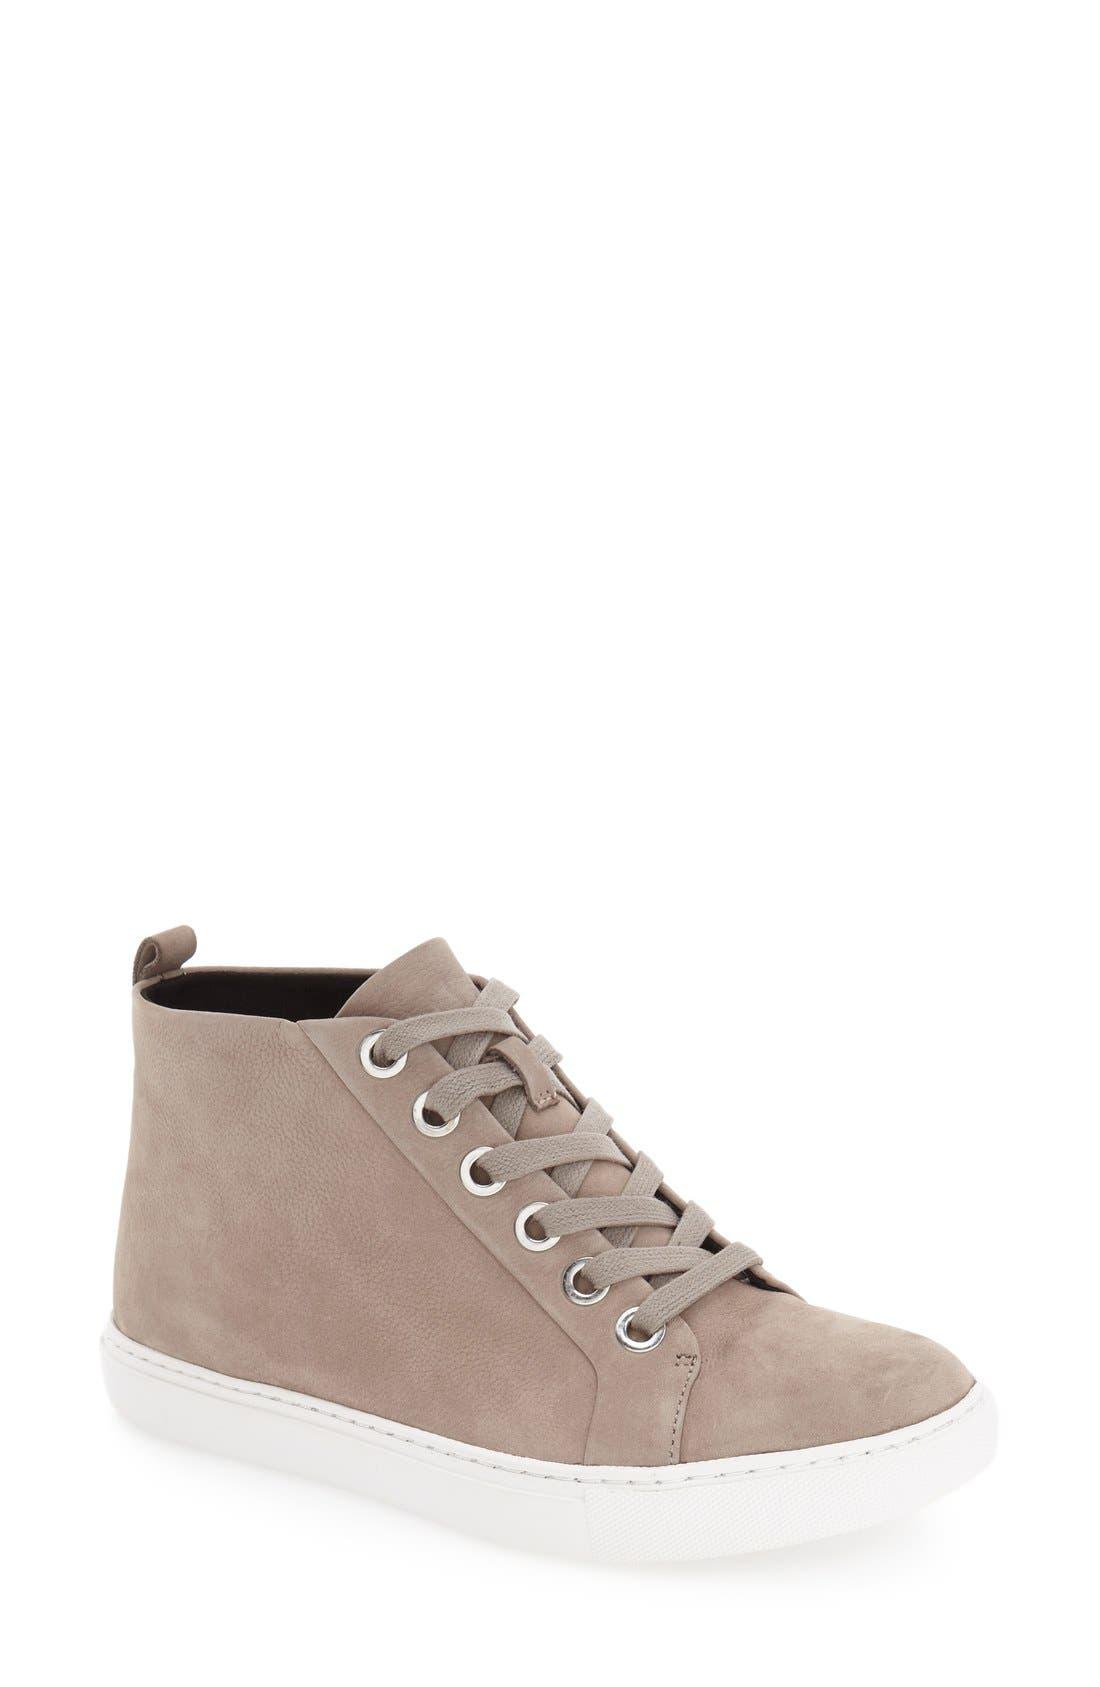 'Kaleb' High Top Sneaker,                         Main,                         color, Cloud Nubuck Leather